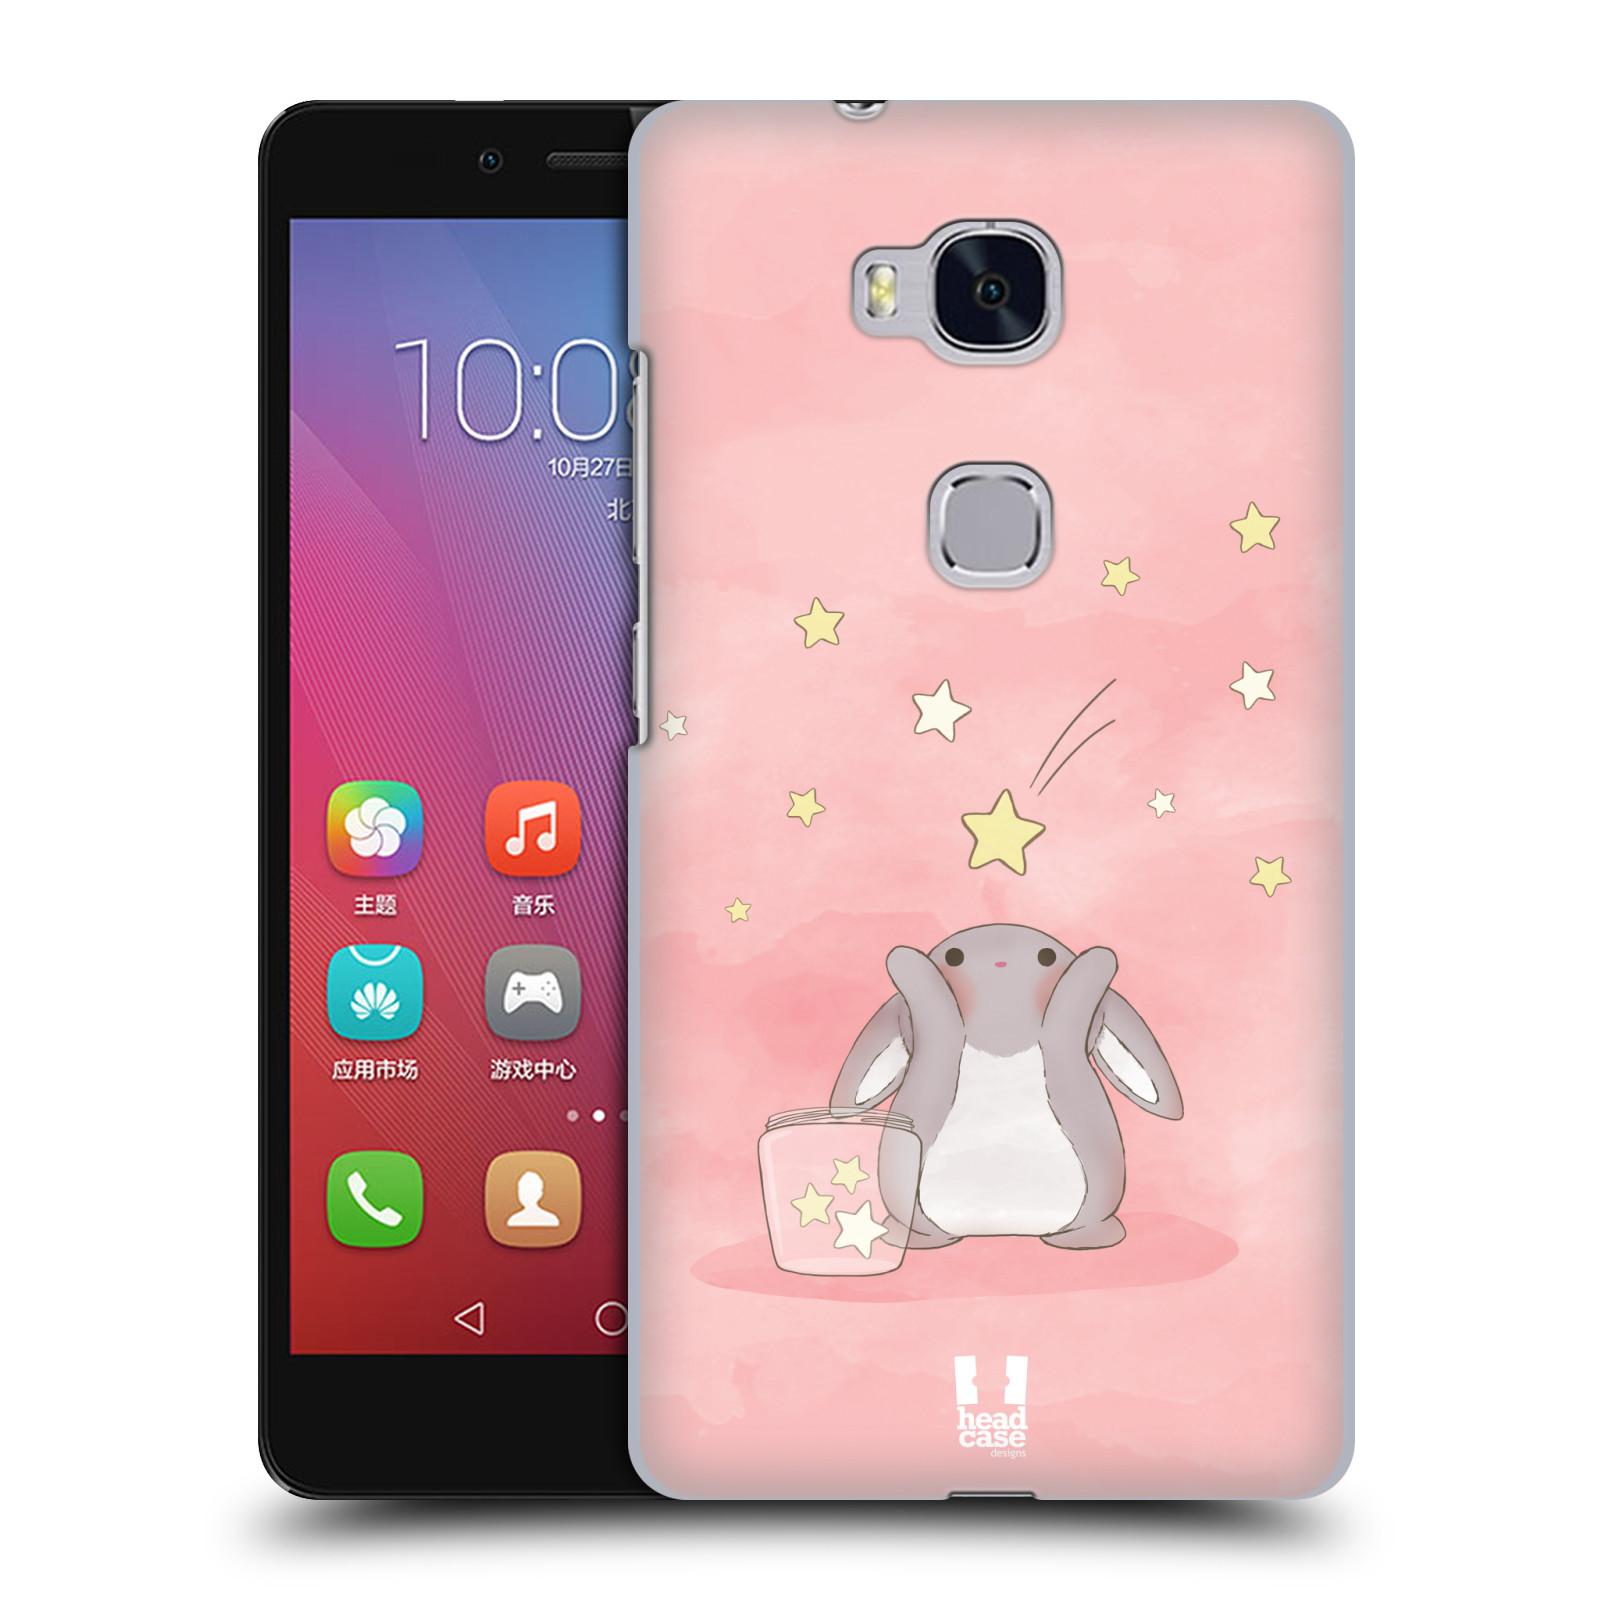 HEAD CASE pevný plastový obal na mobil HUAWEI HONOR 5X vzor králíček a hvězdy růžová